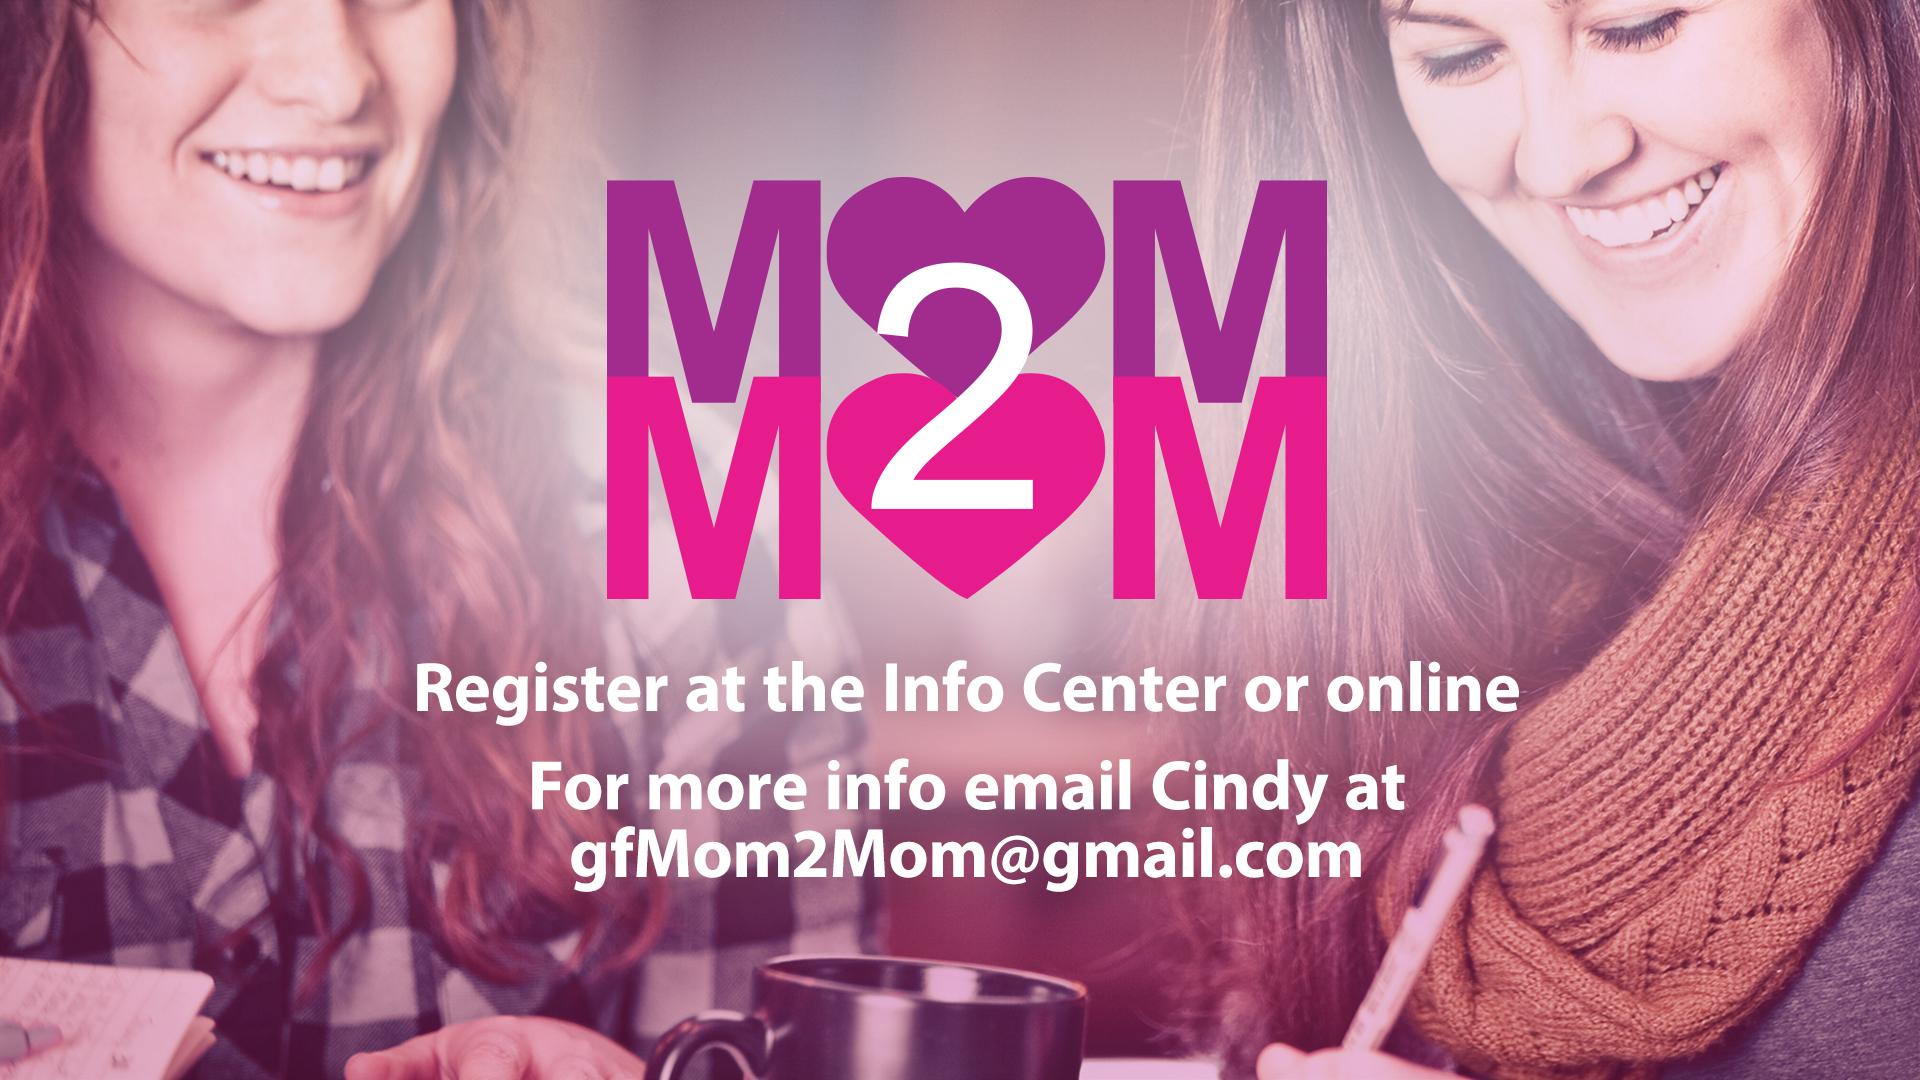 Halfmoon Mom2Mom